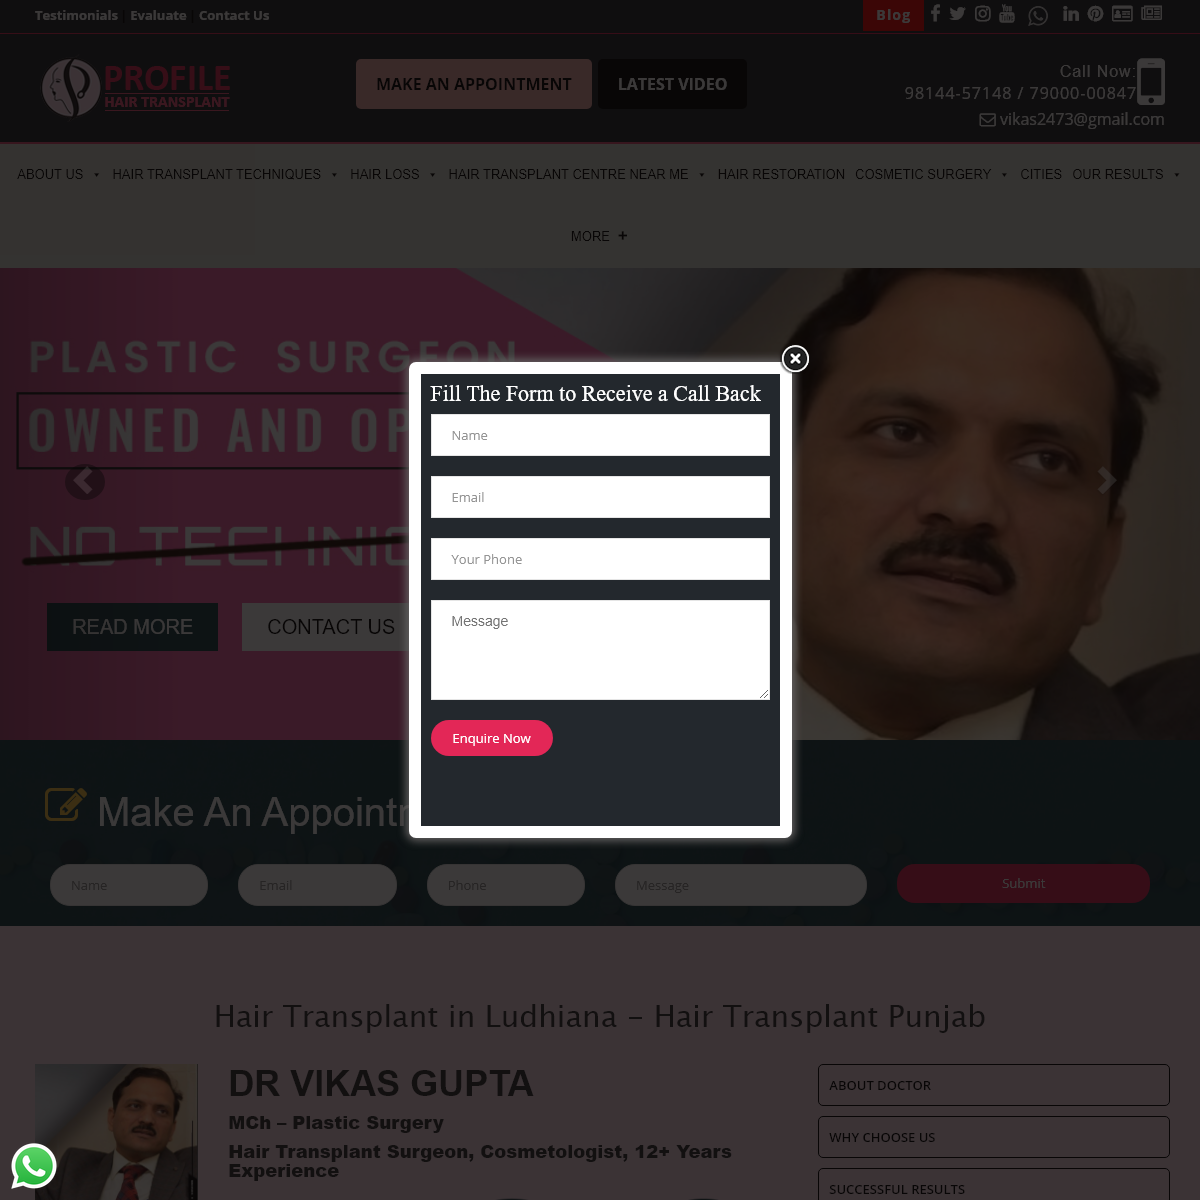 Hair Transplant - Hair Transplant Cost in Punjab, Ludhiana